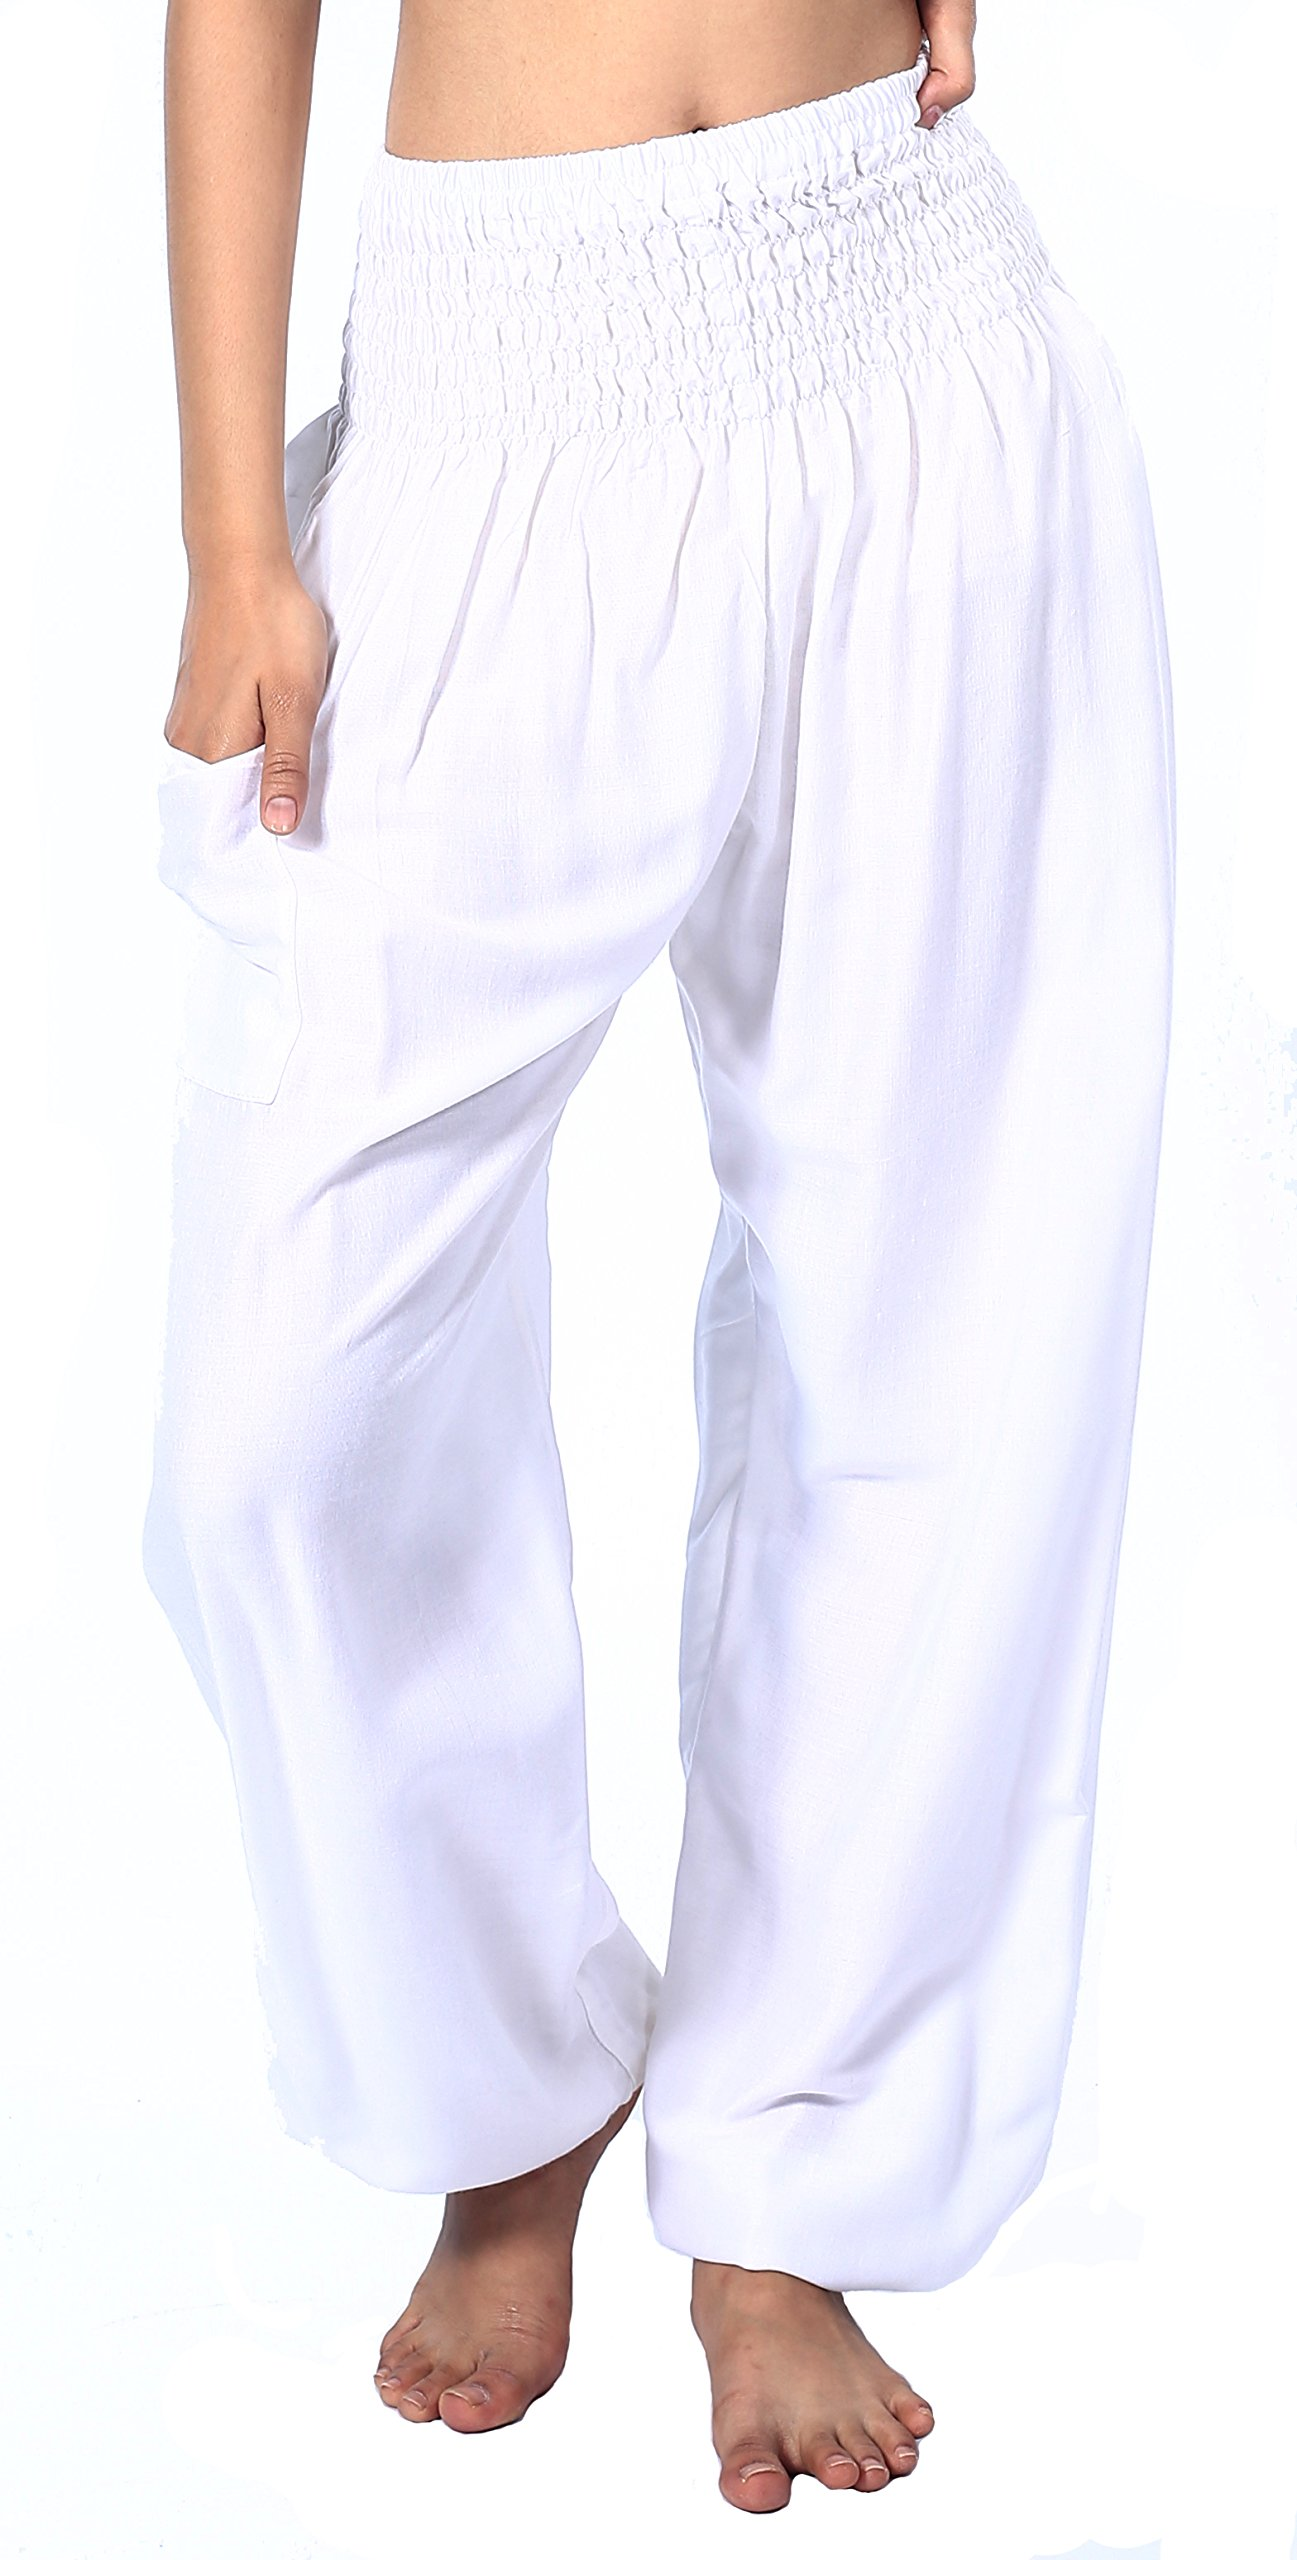 Boho Vib Women's Rayon Print Smocked Waist Boho Harem Yoga Pants (Small/Medium, Solid White)